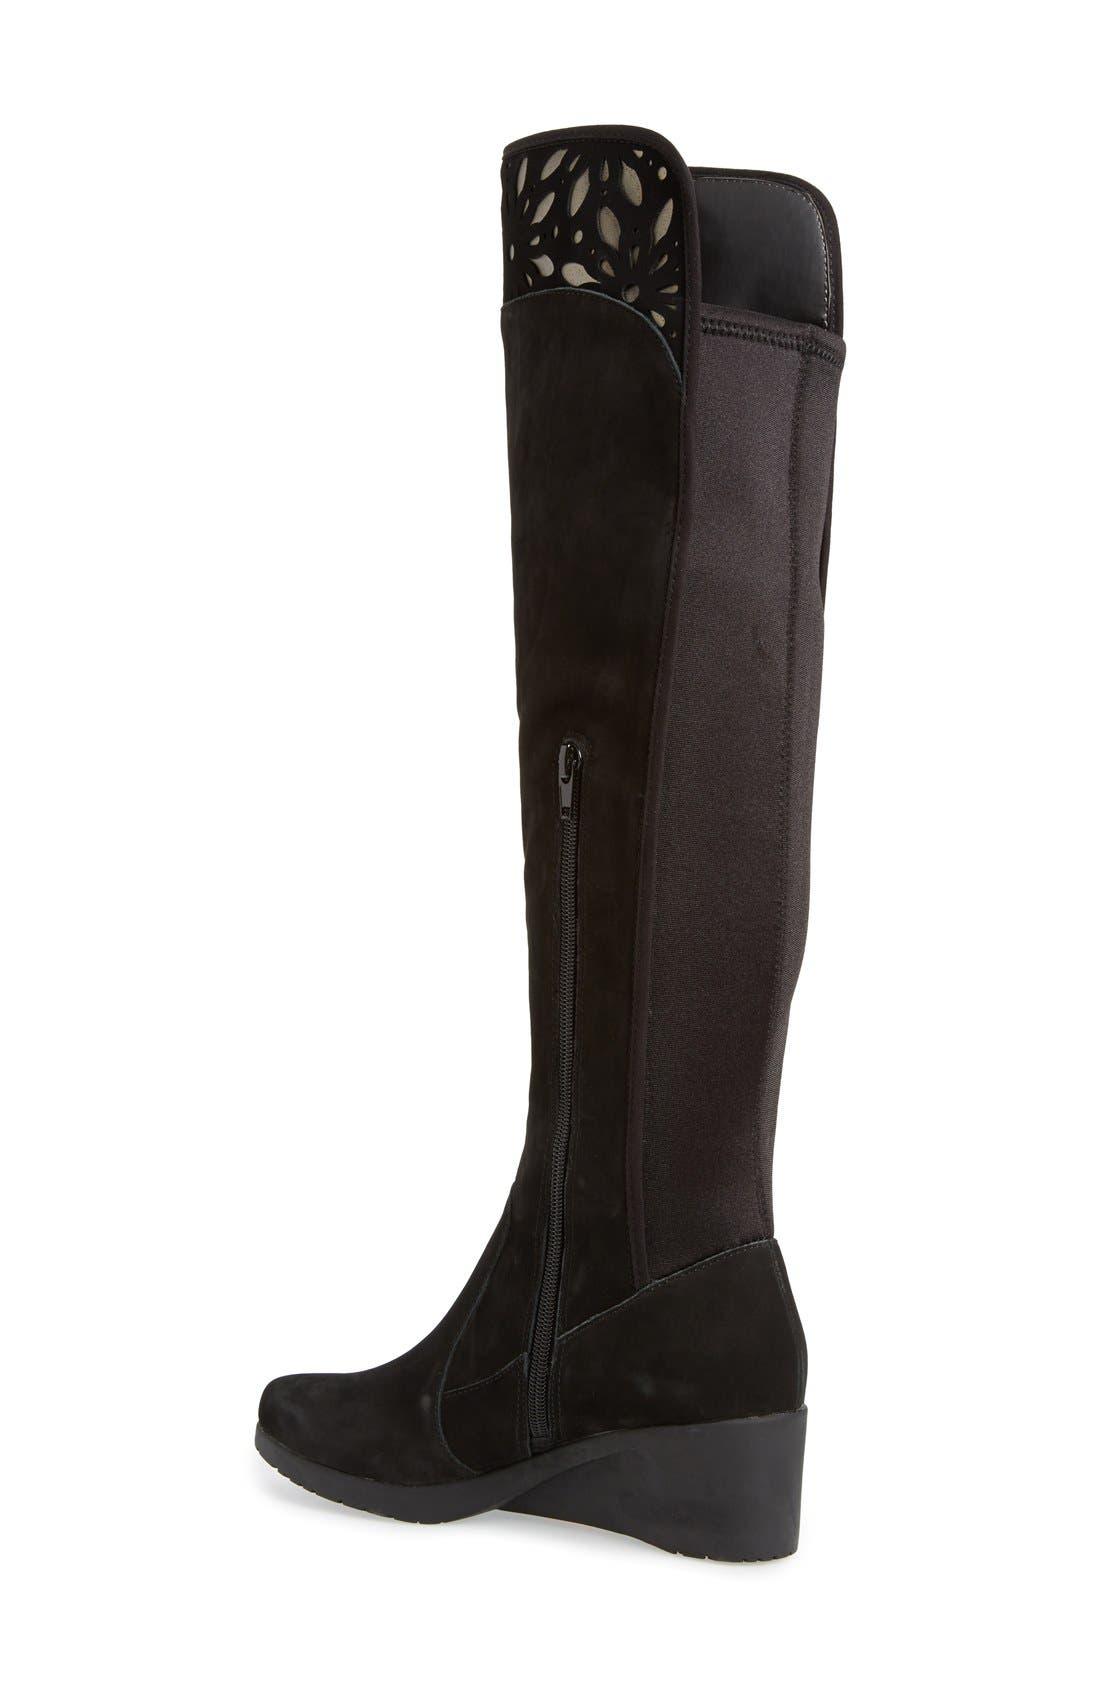 Alternate Image 2  - Jambu'Natalia' CutoutDetail Water ResistantOver the Knee Boot (Women)